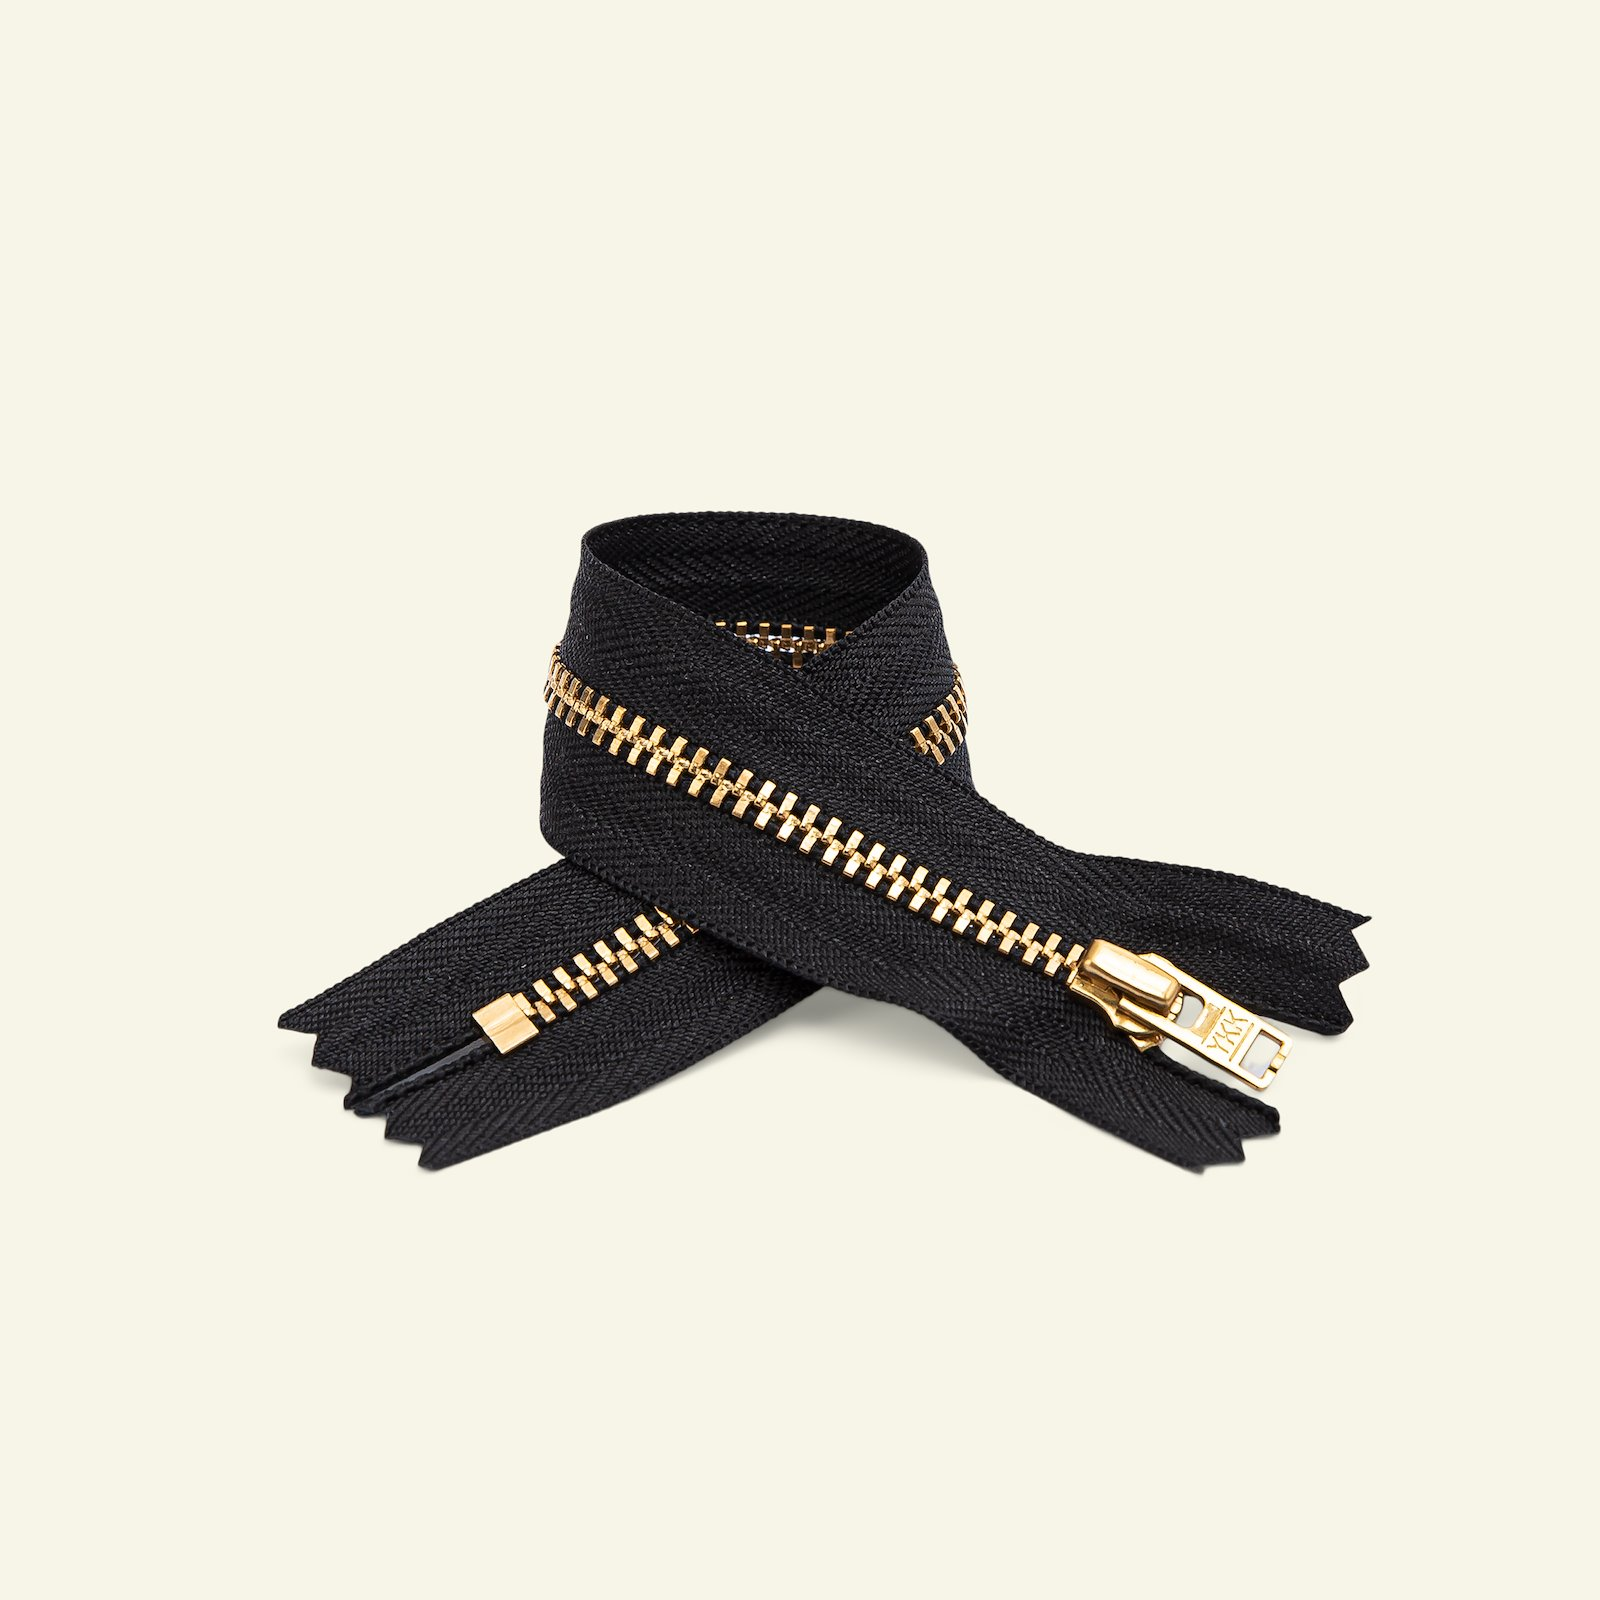 YKK zip 4mm trousers closed 12cm black x40043_pack